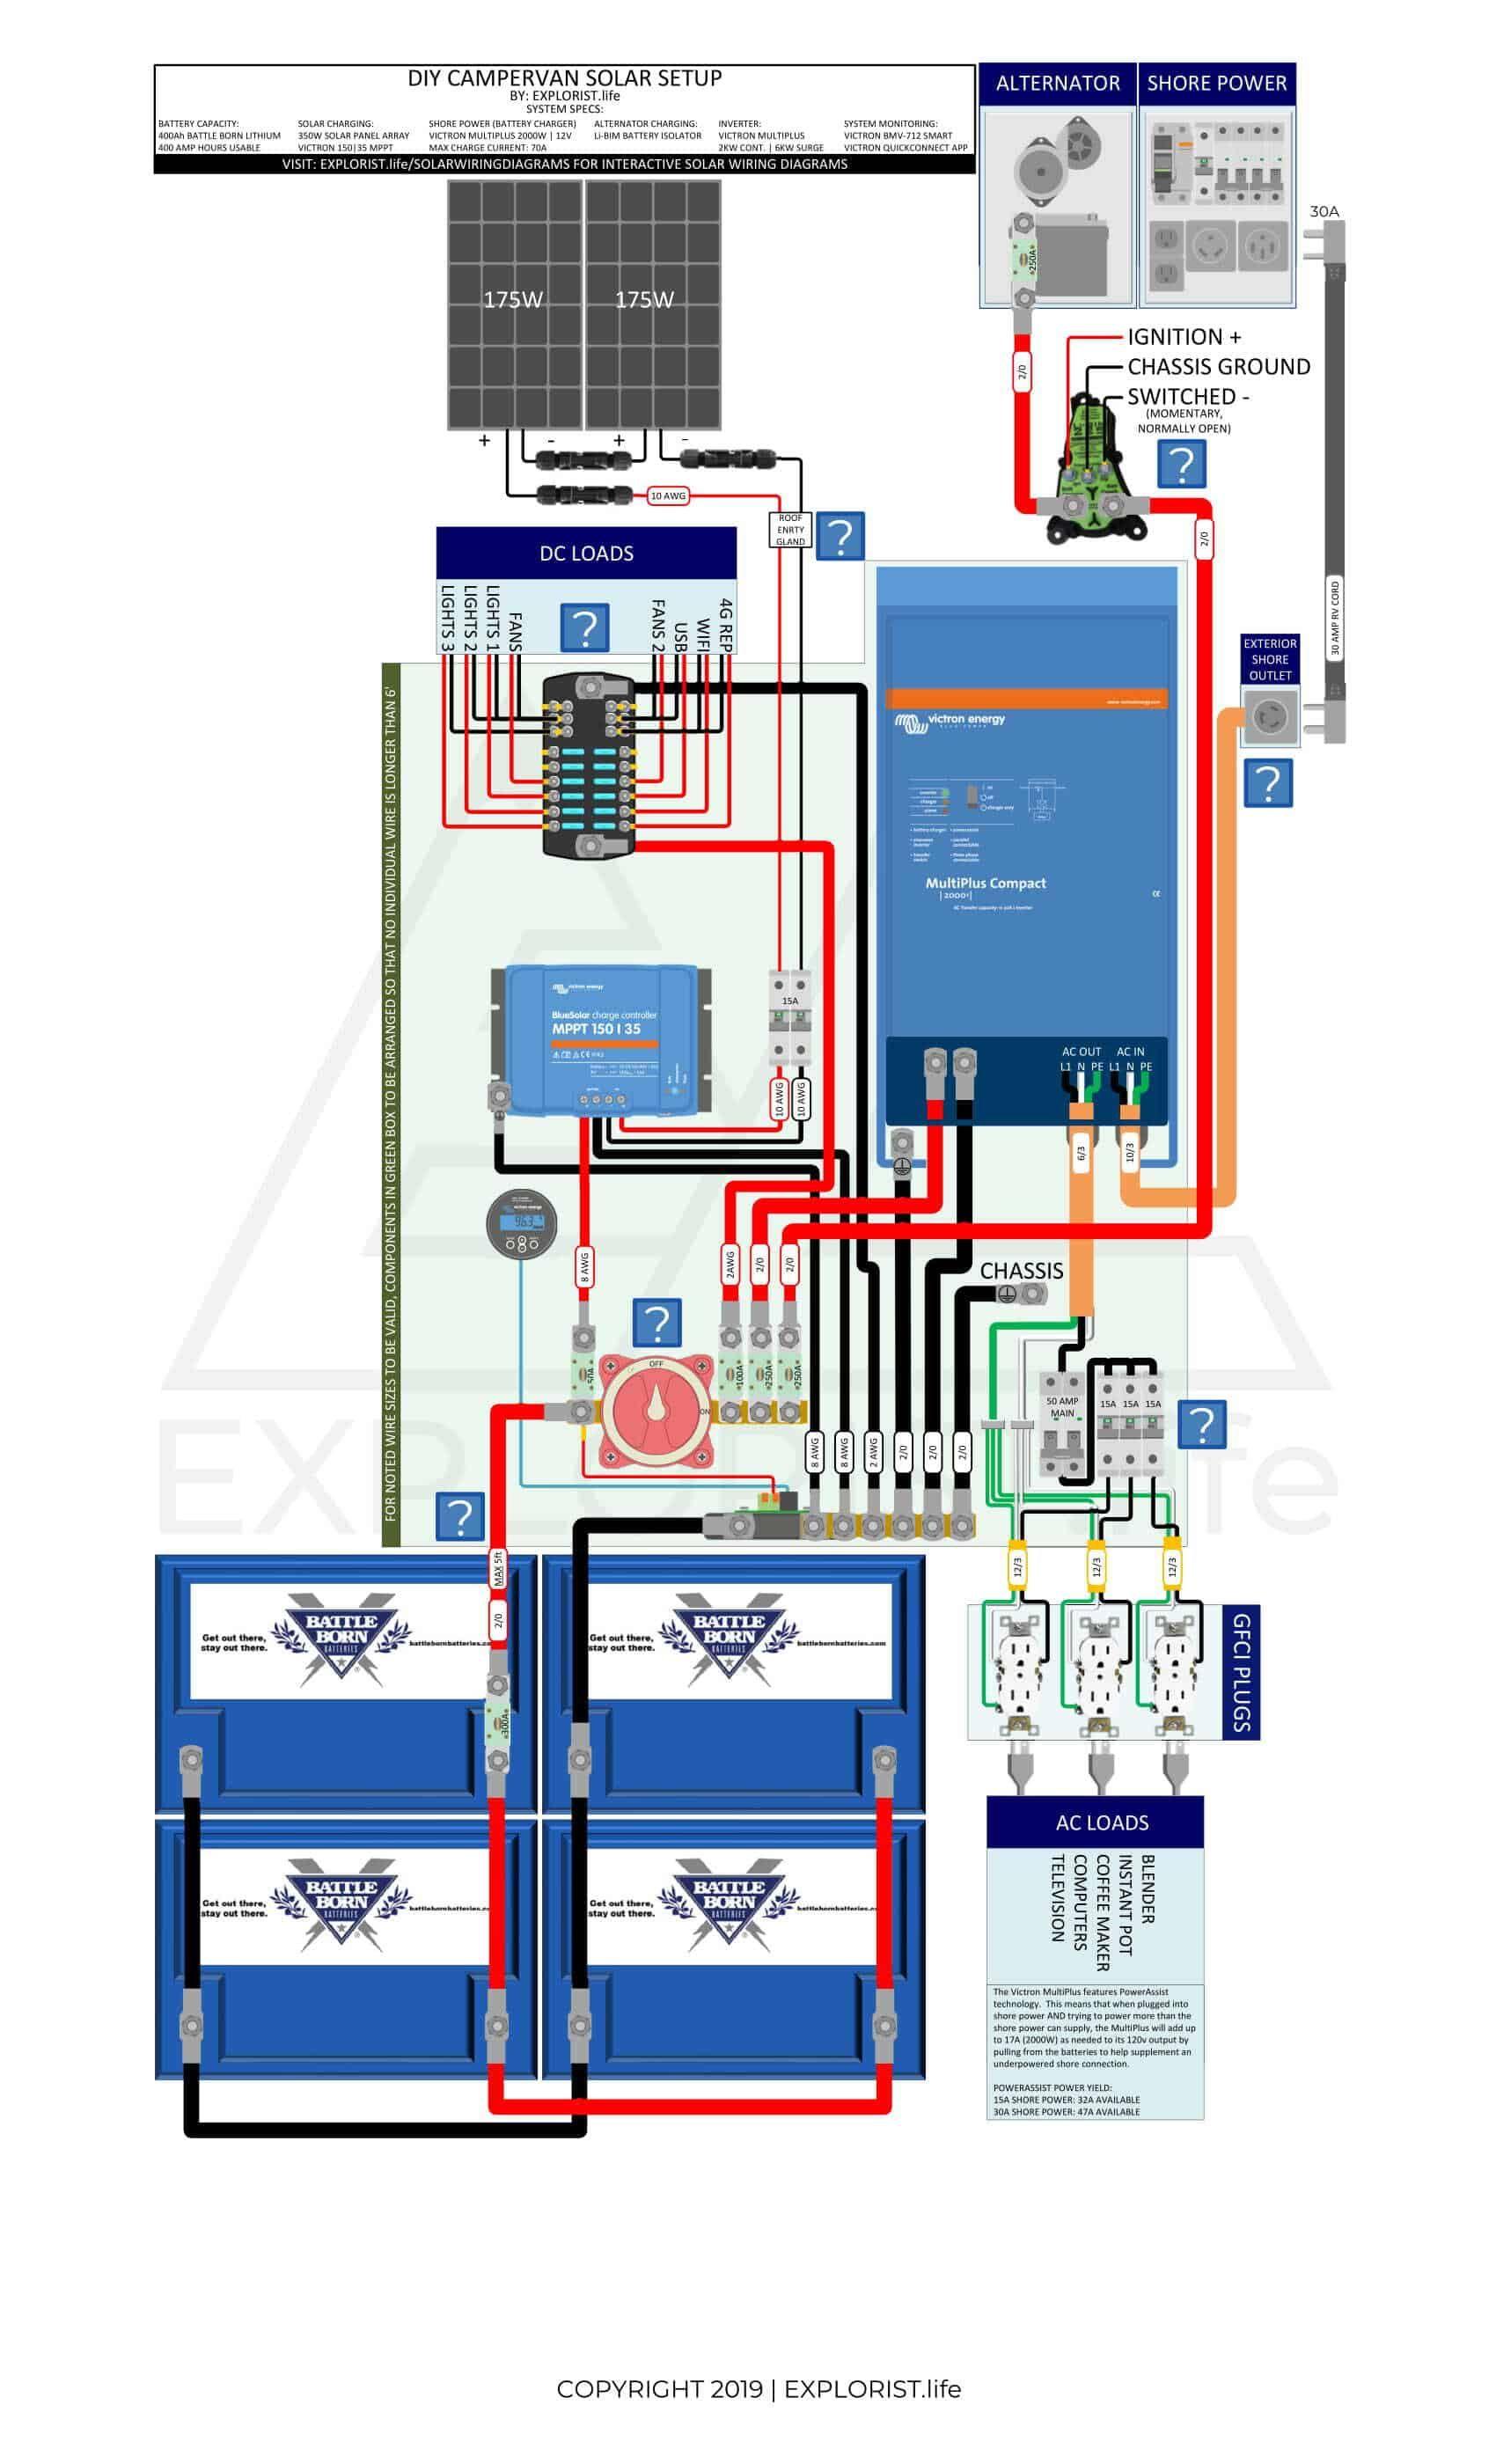 Diy Solar Wiring Diagrams For Campers Van S Rv S Diy Solar Solar Panels Rv Solar